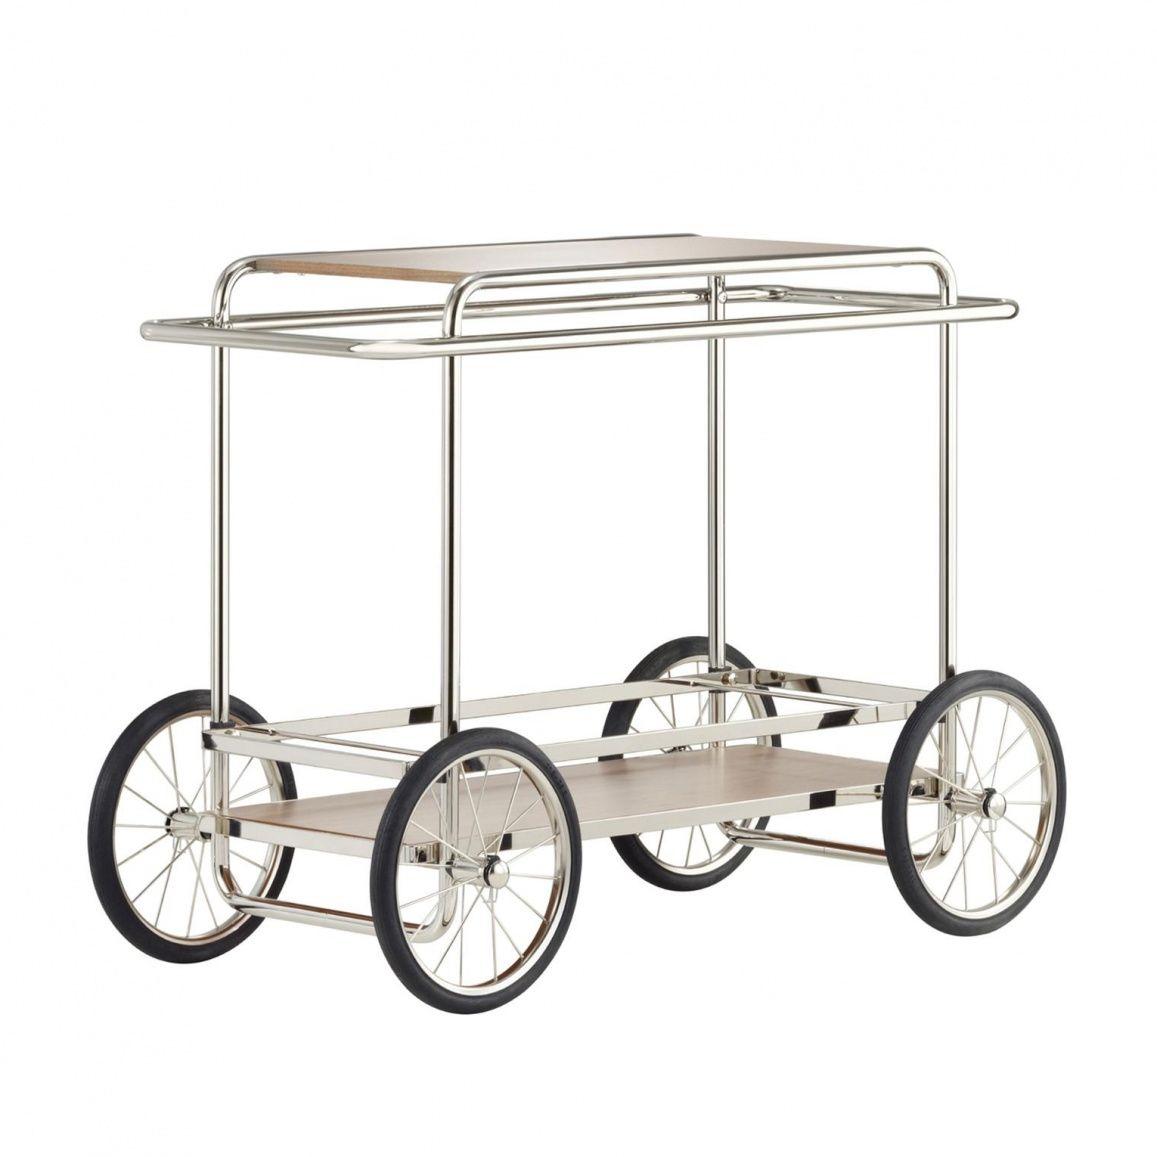 tecta m4r servierwagen tecta. Black Bedroom Furniture Sets. Home Design Ideas